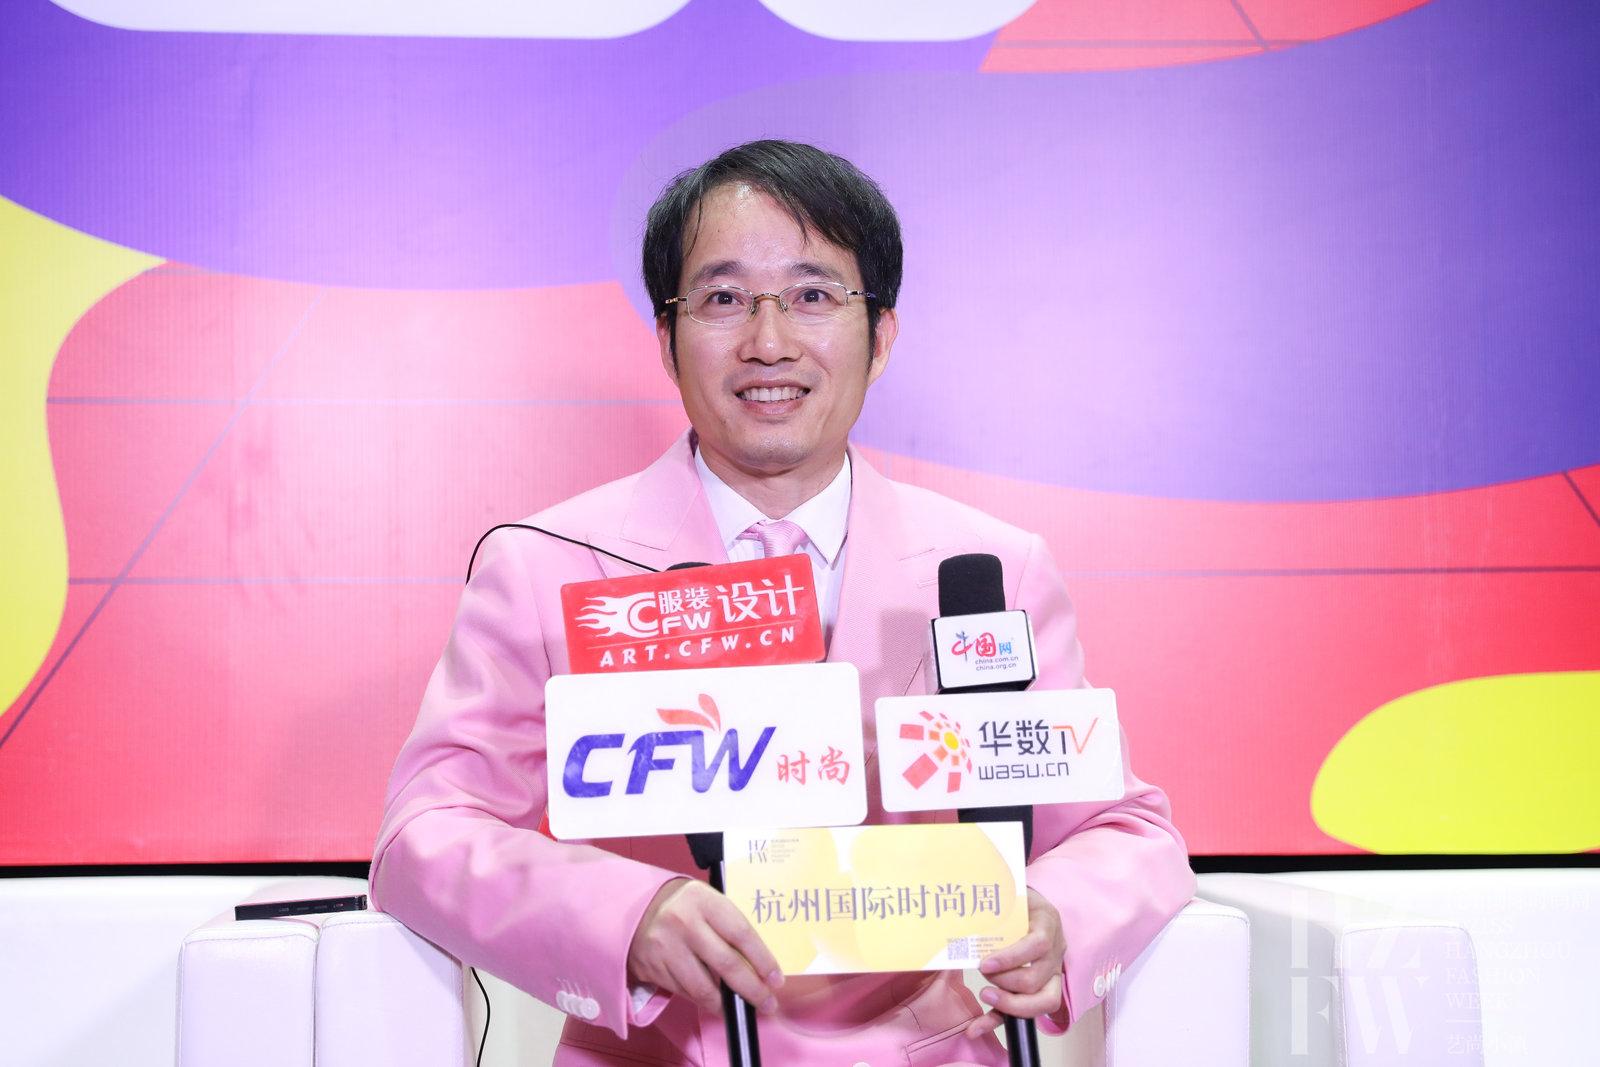 2021ss杭州國際時尚周 | CFW時尚專訪共贏會服裝源頭供應鏈春夏發布會